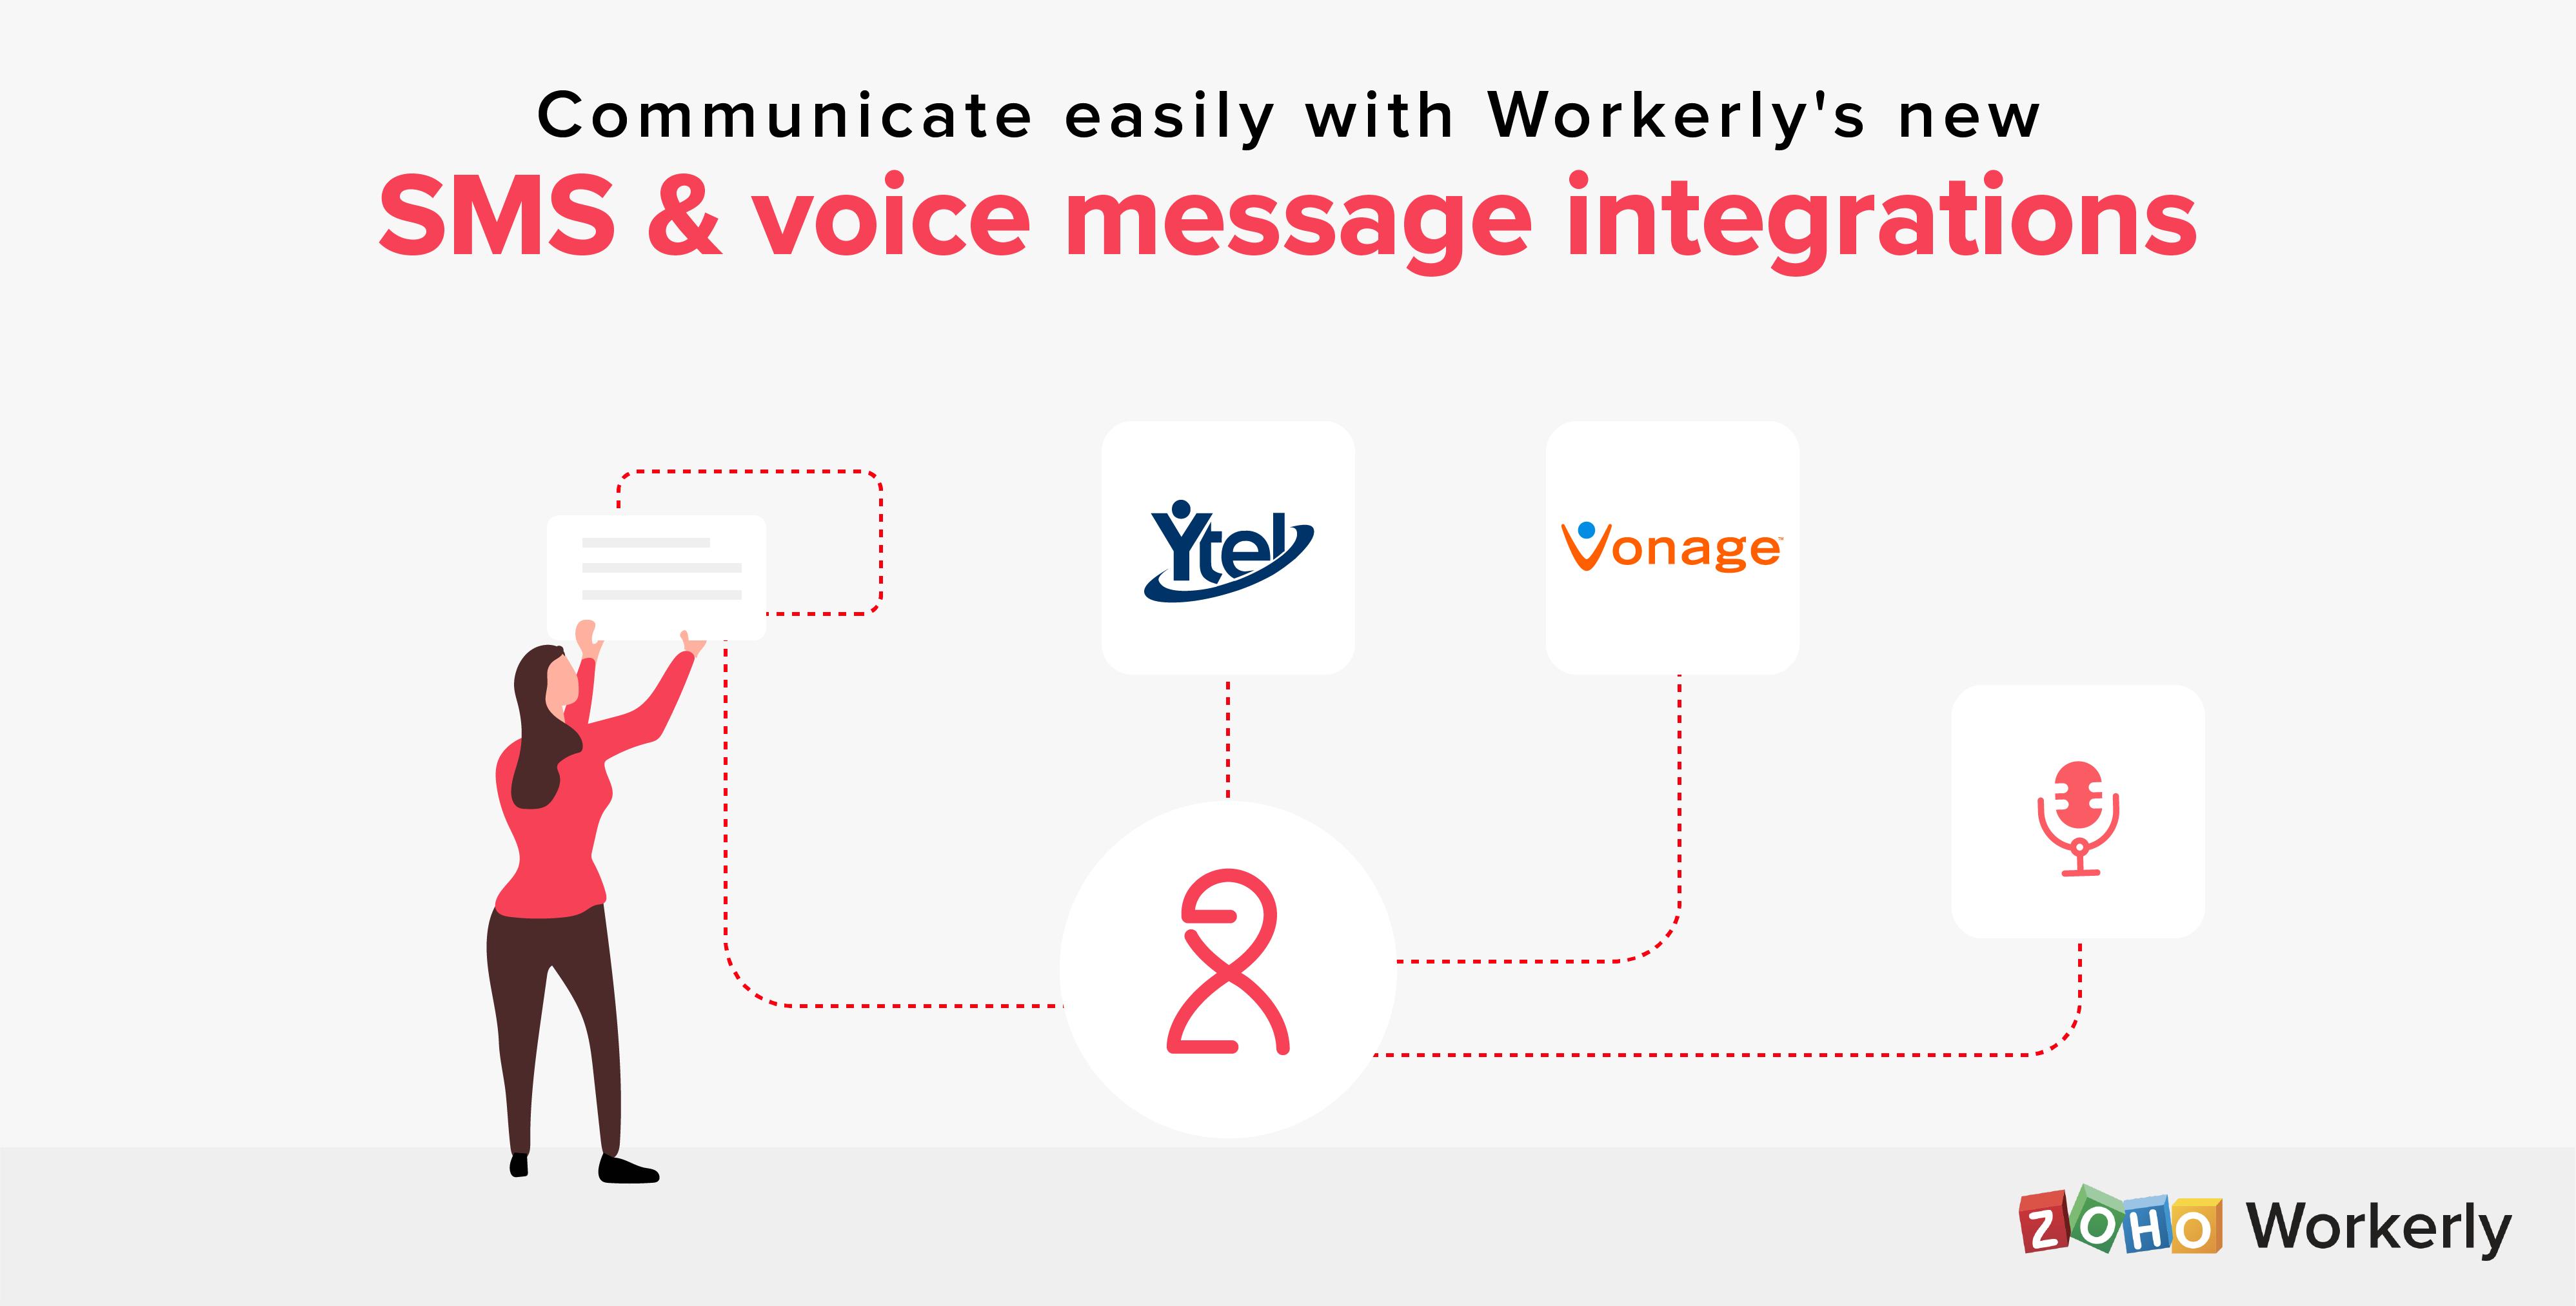 Ytel and Vonage in Workerly